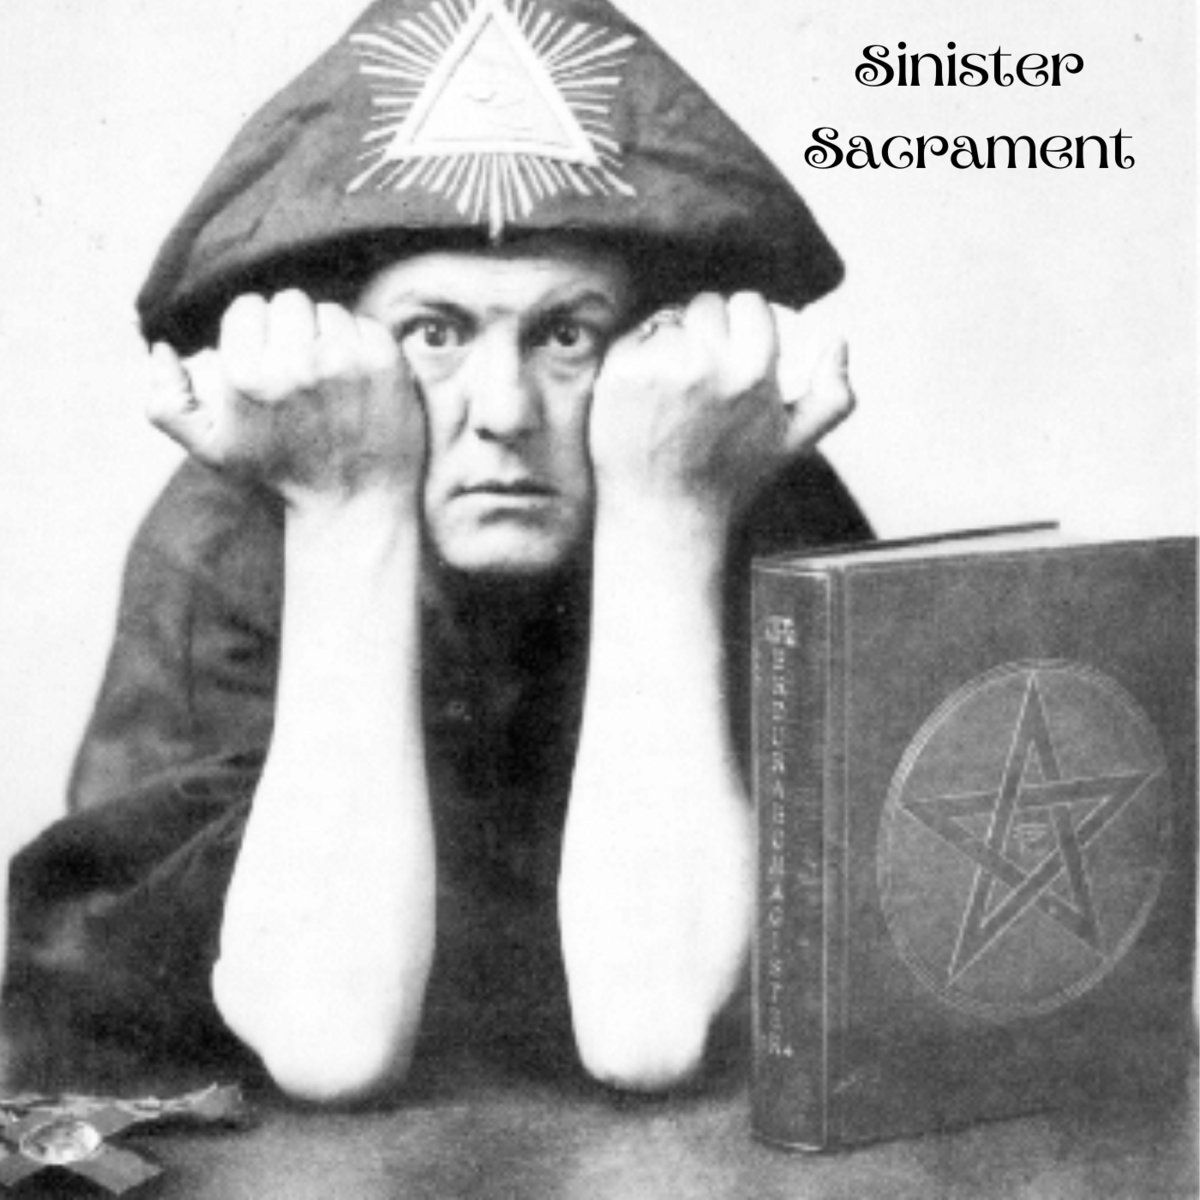 Reviews for Sinister Sacrament - Sinister Sacrament